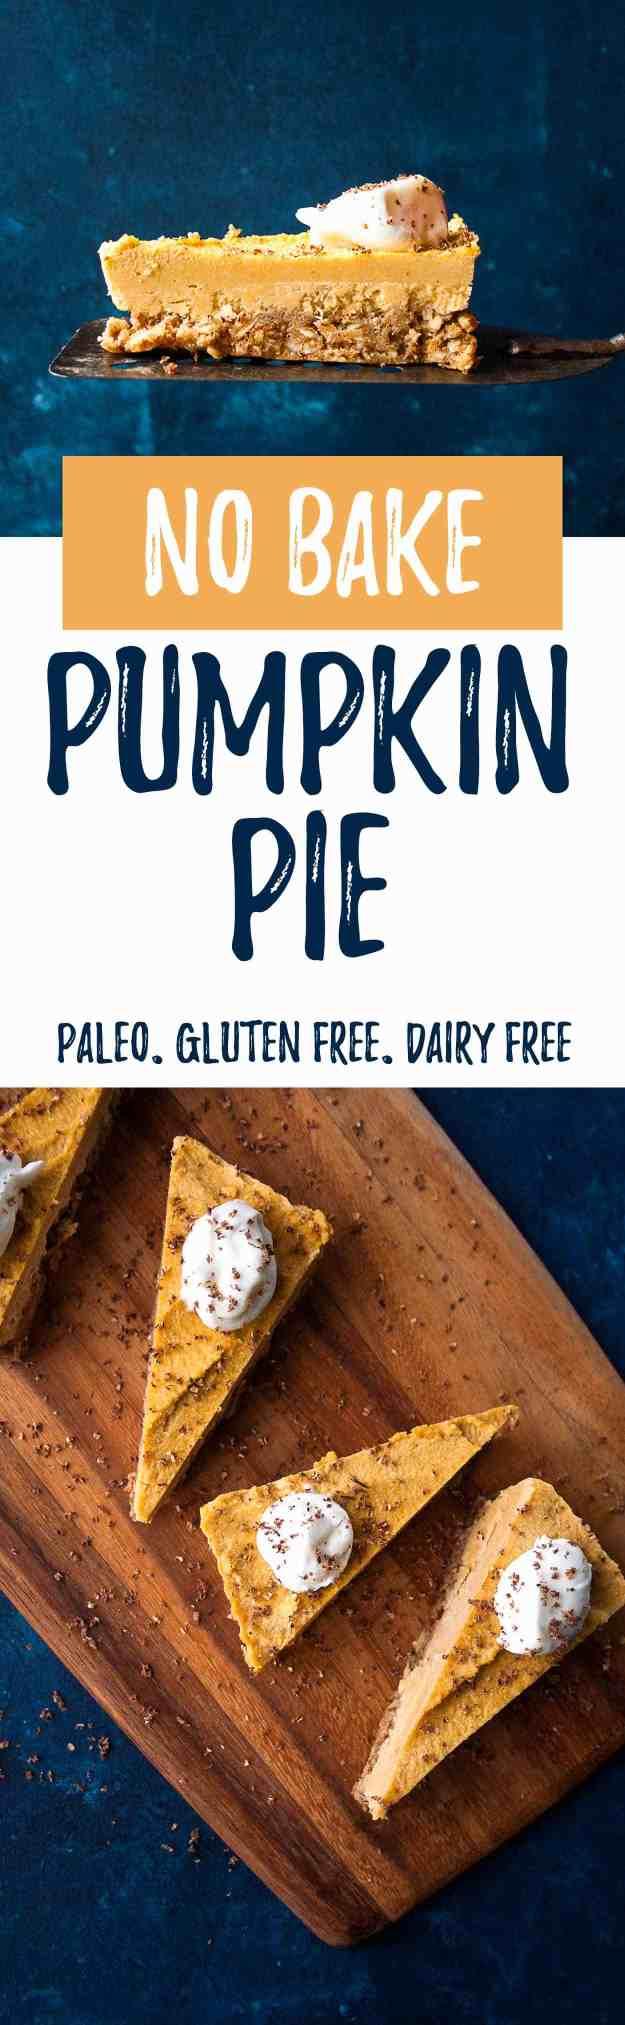 No Bake Pumpkin Pie (Vegan!) | #pumpkinpie #thanksgiving #holiday #vegan #paleo #glutenfree | hungrybynature.com